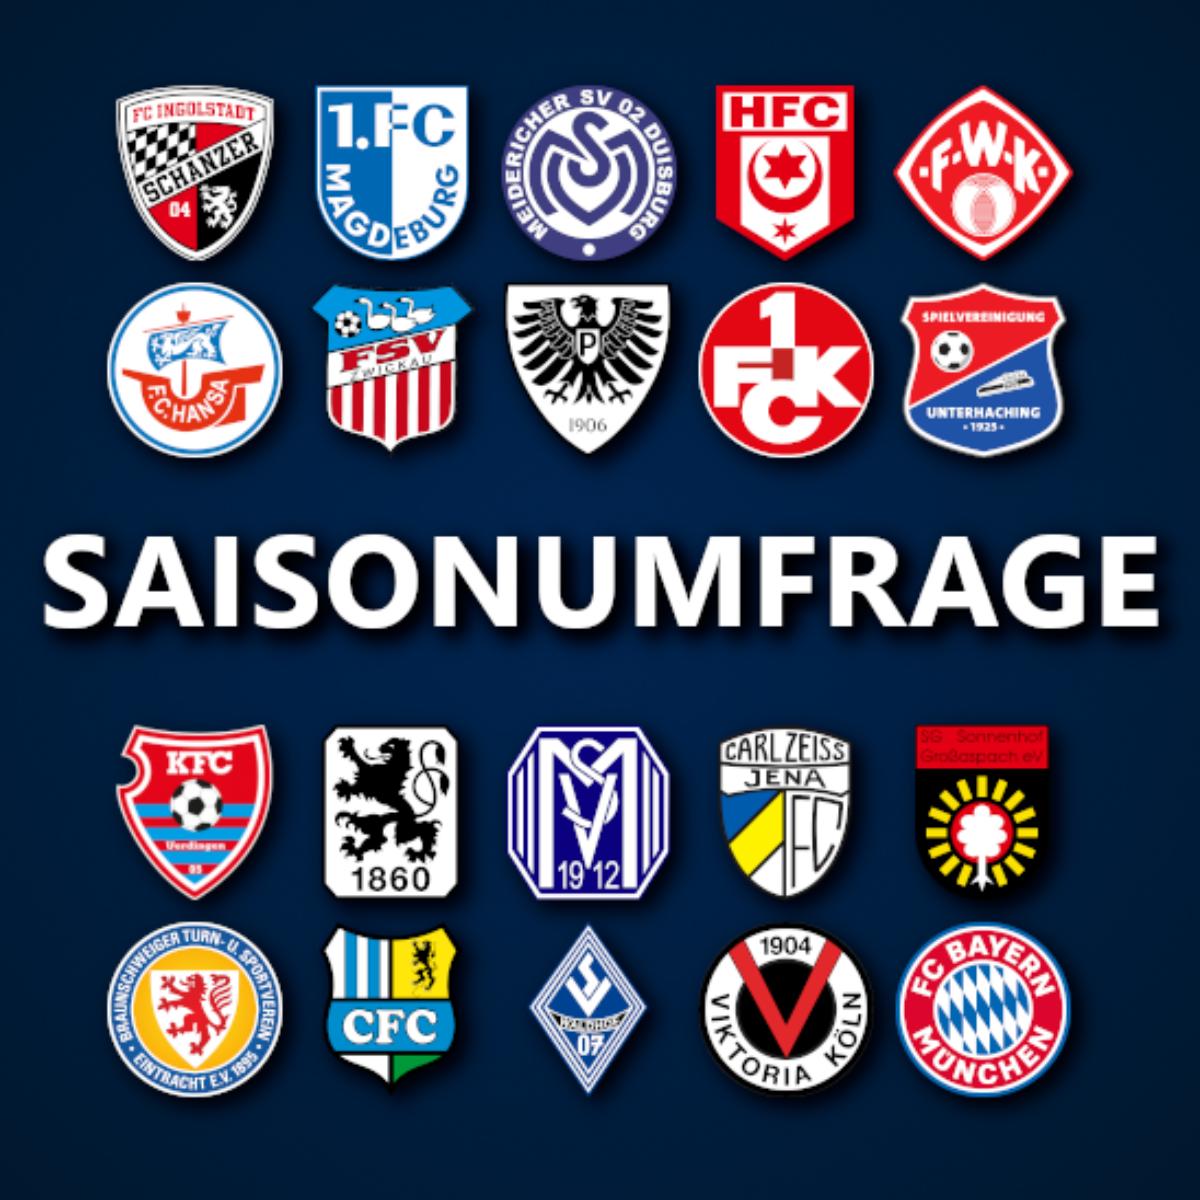 Saisonumfrage zur 3. Liga